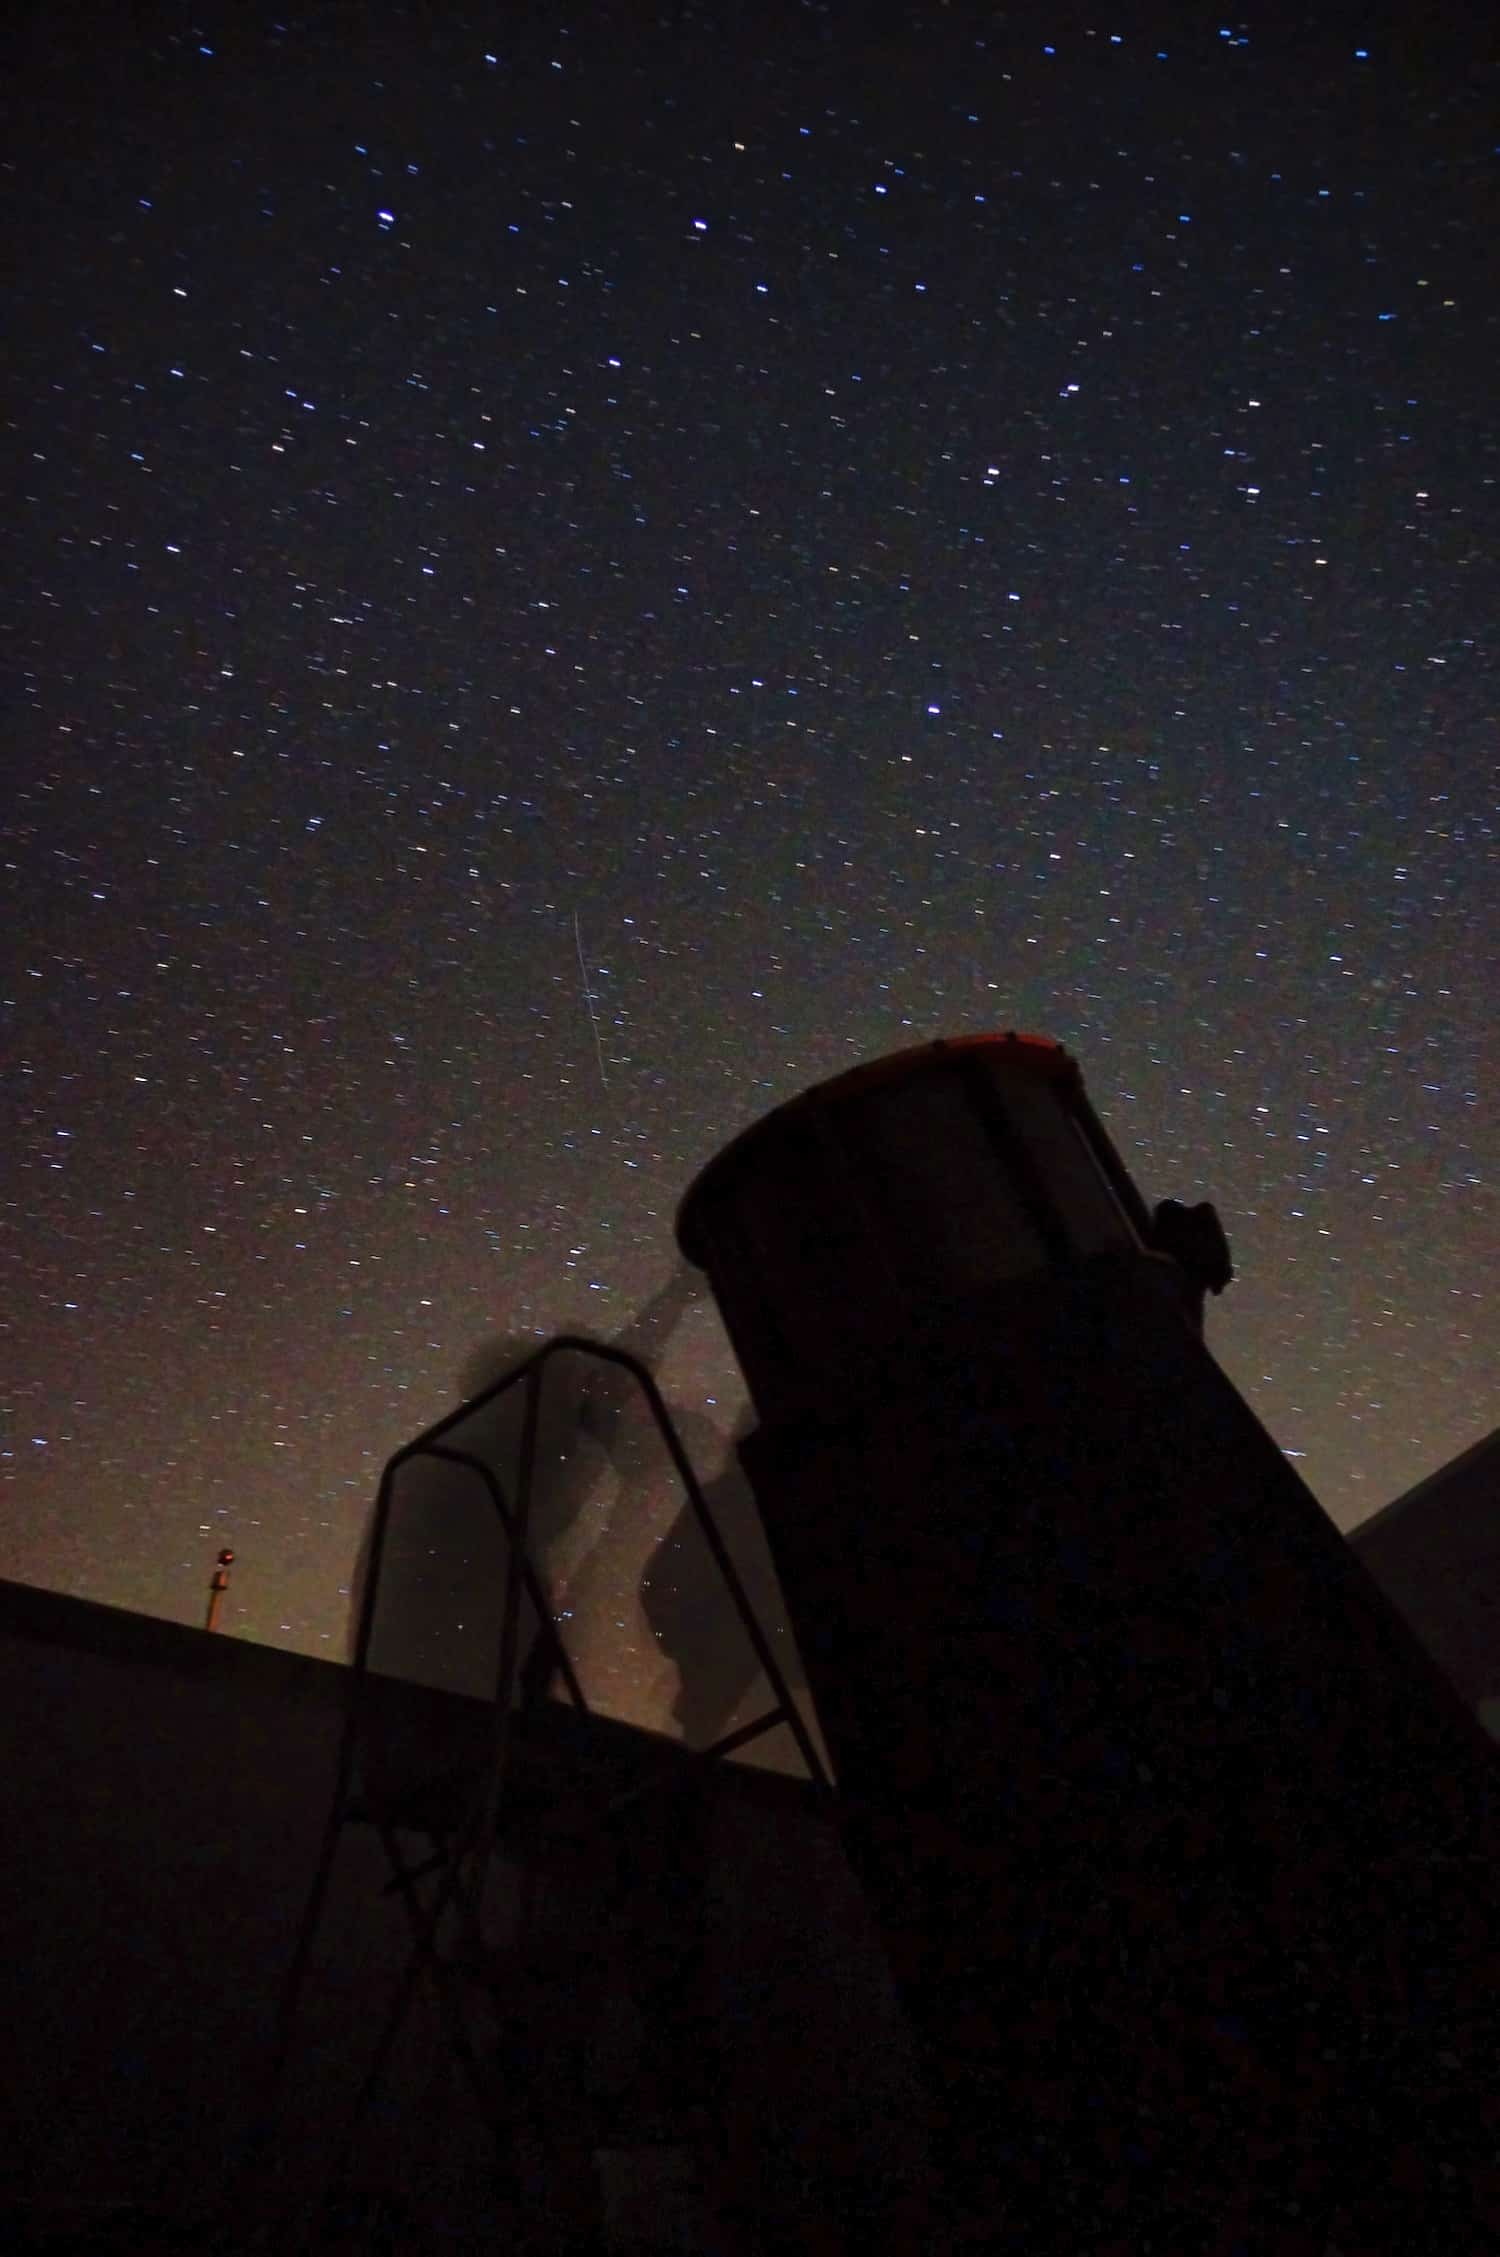 2019 Recap - May - Stargazing in Ohio